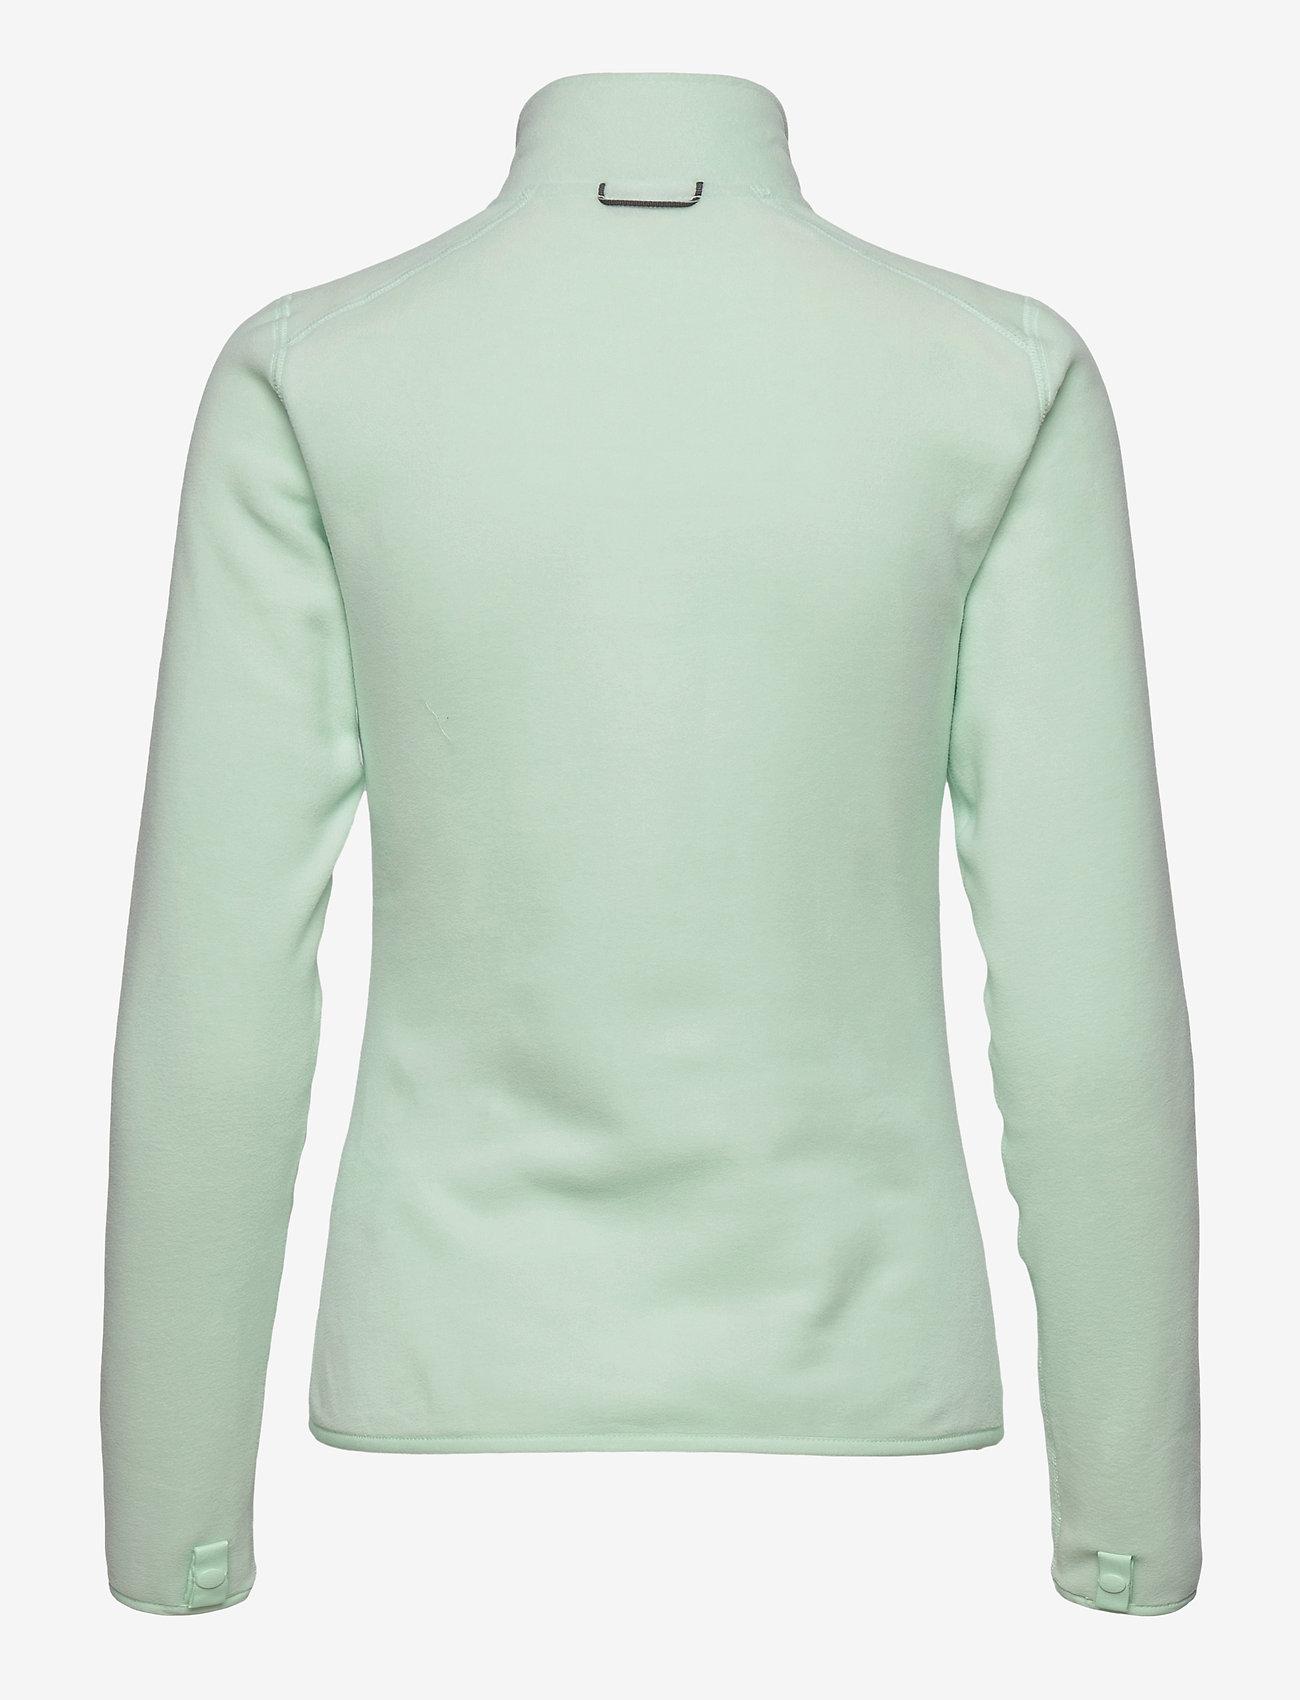 The North Face - W 100 GLACIER FULL ZIP - EU - fleece - misty jade - 1